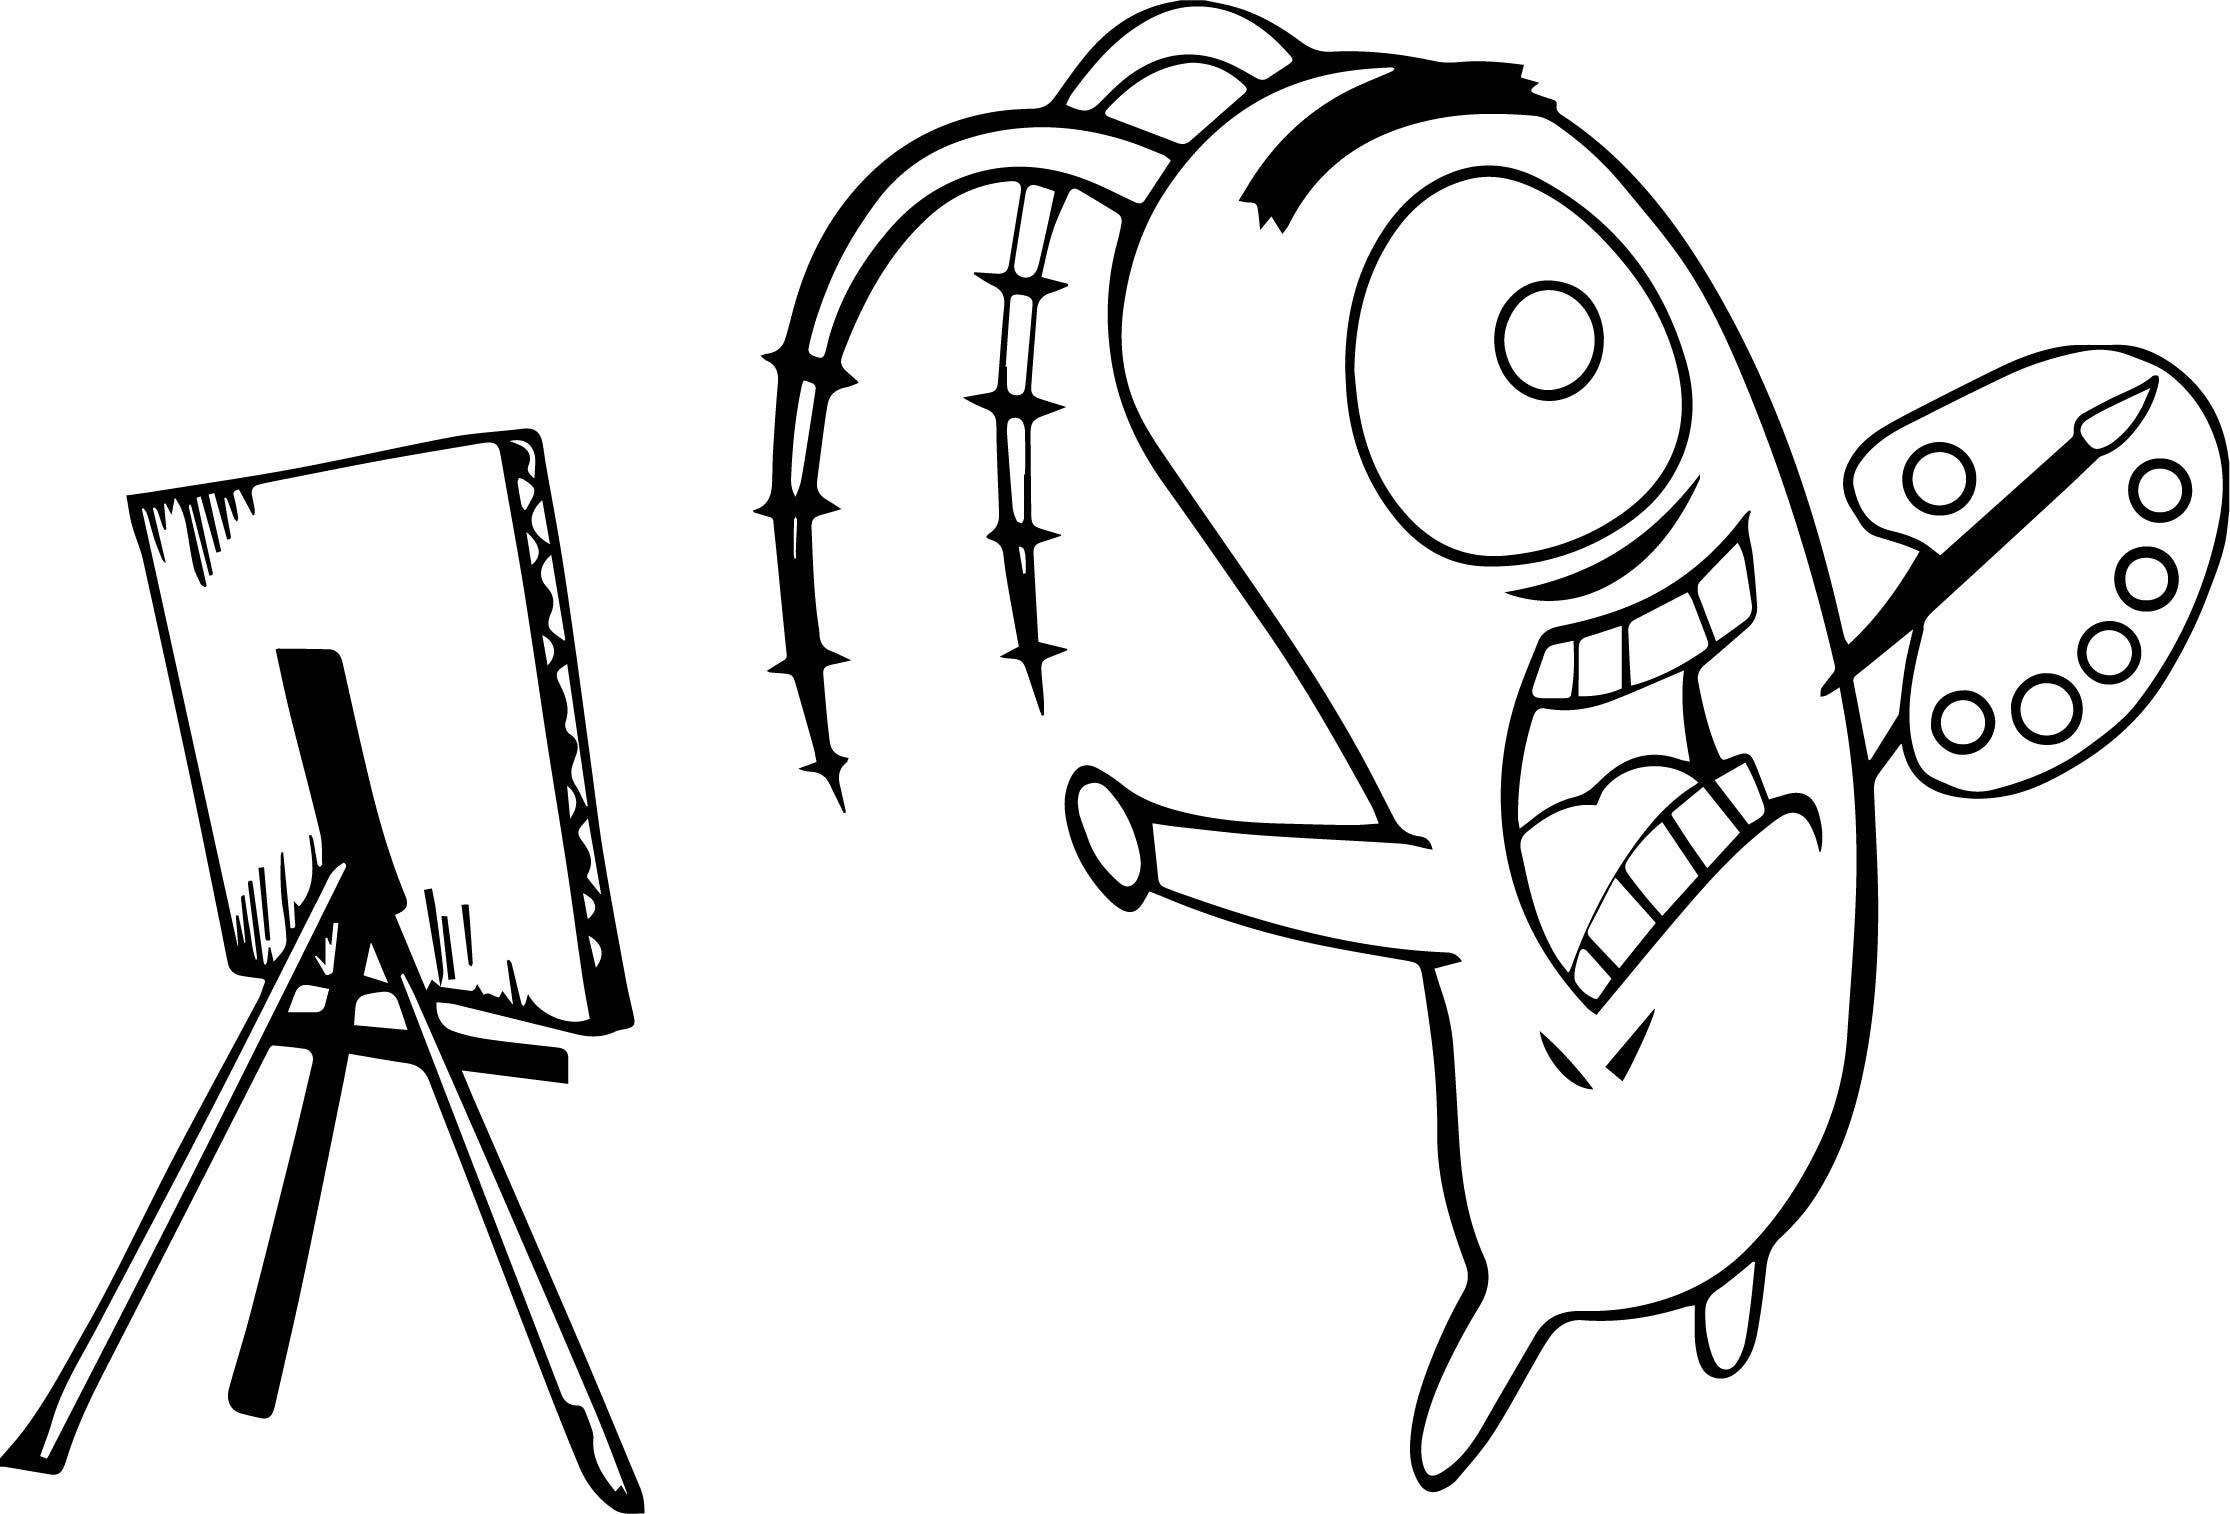 Spongebob Cartoon Drawing at GetDrawings.com | Free for personal use ...